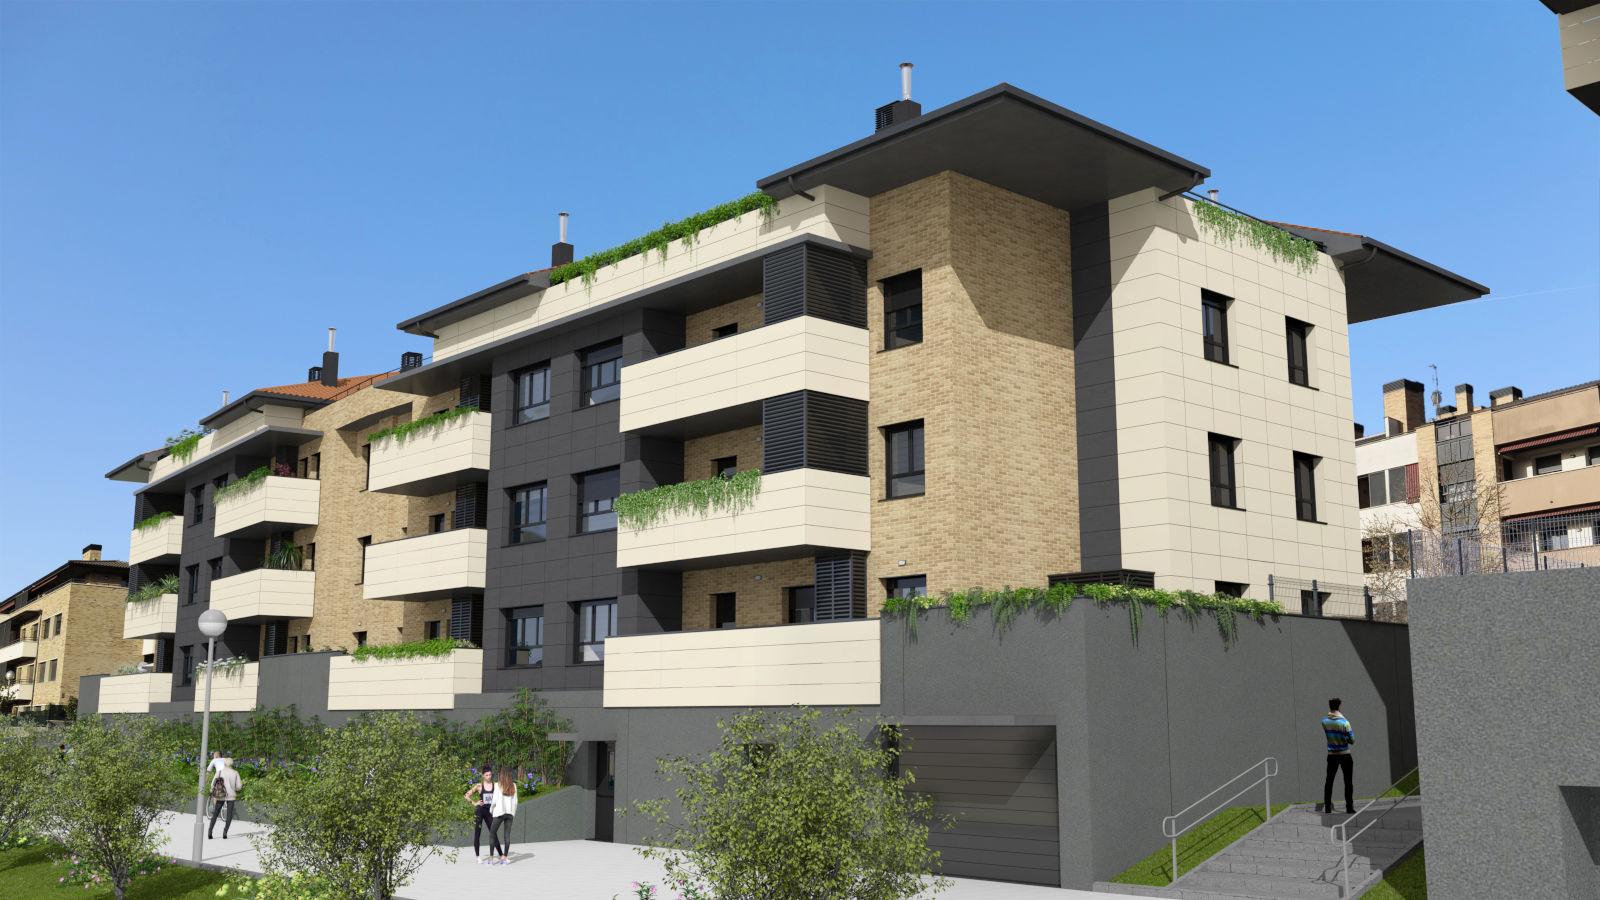 Residencial Landabarri